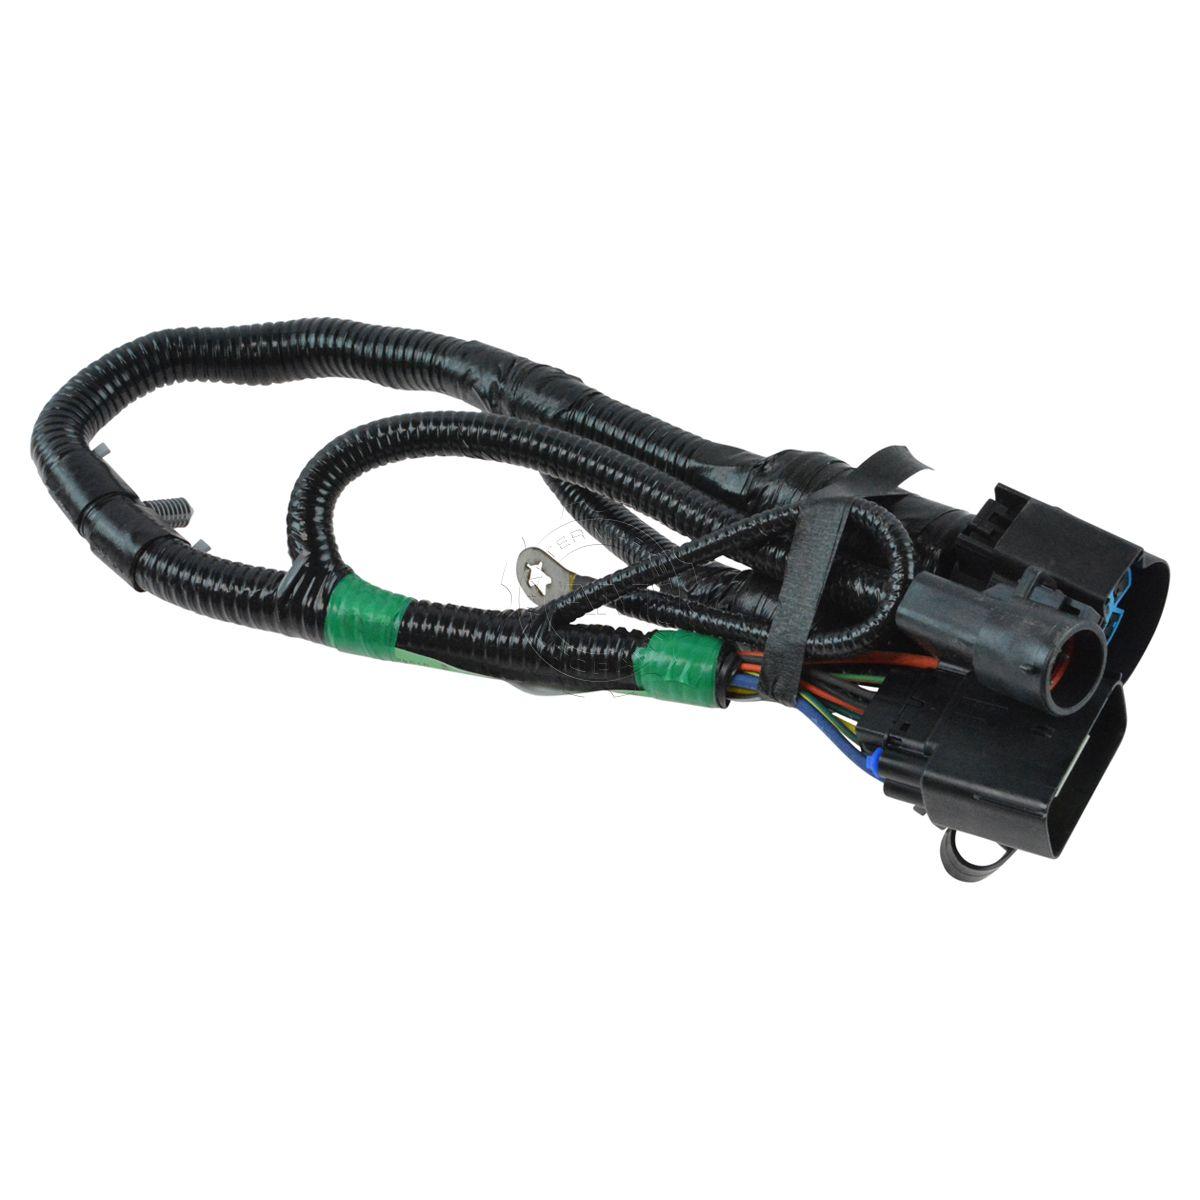 oem 7 way pin connector plug trailer towing harness. Black Bedroom Furniture Sets. Home Design Ideas